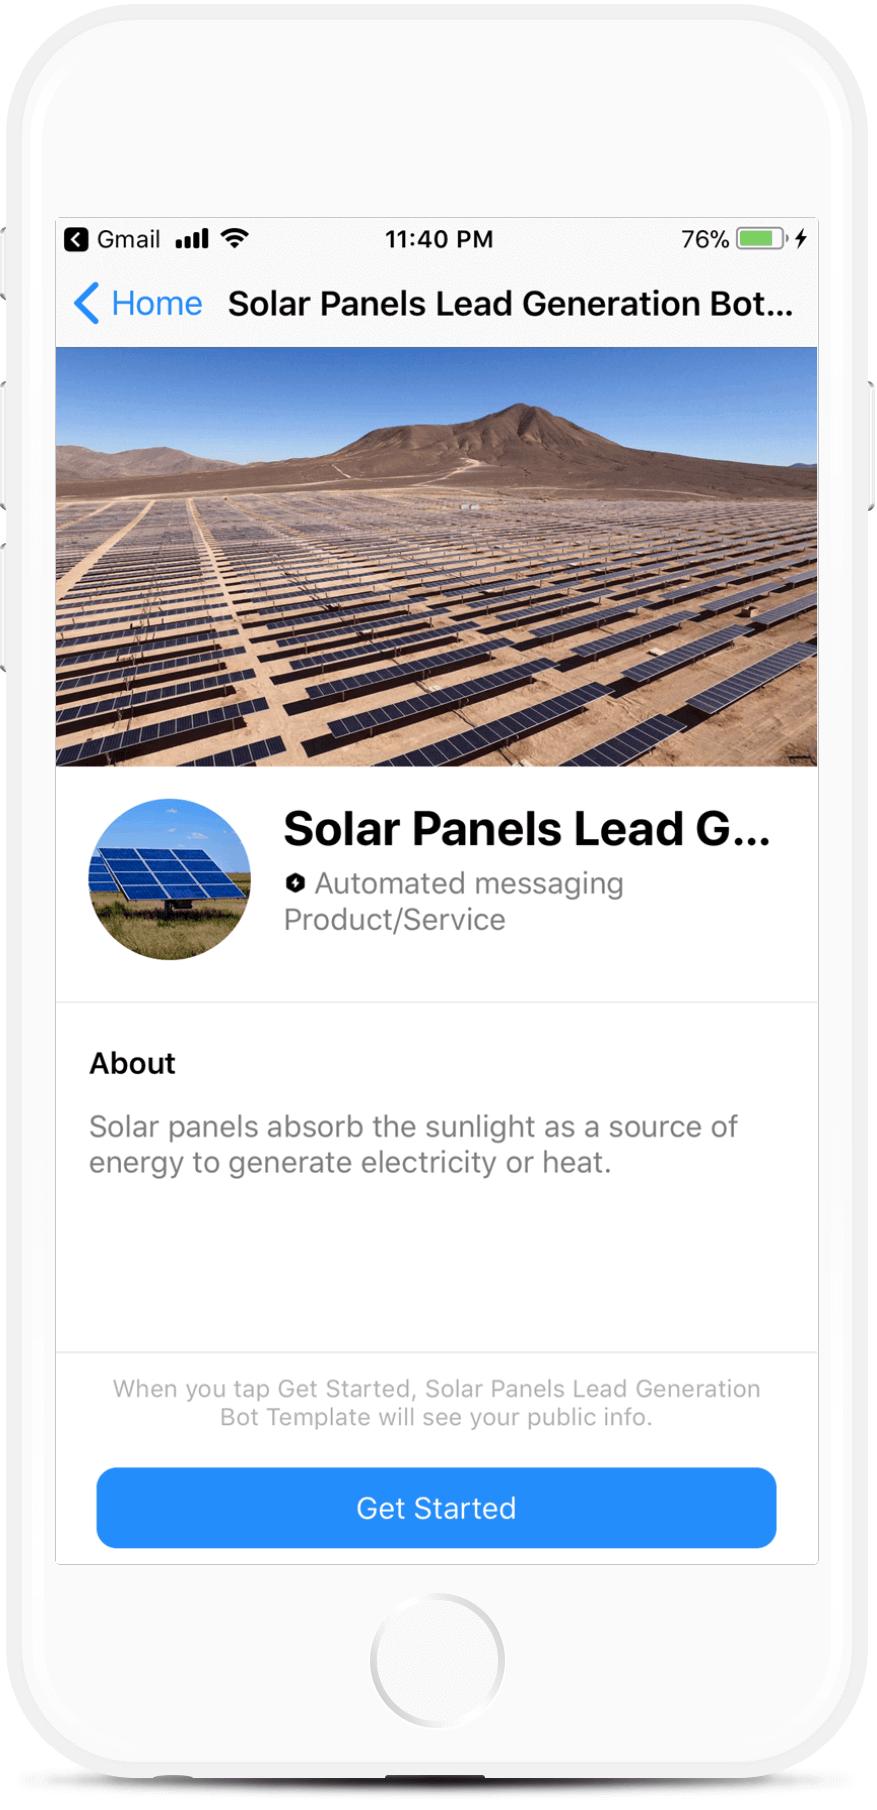 Solar Systems Lead Generation bot screenshot